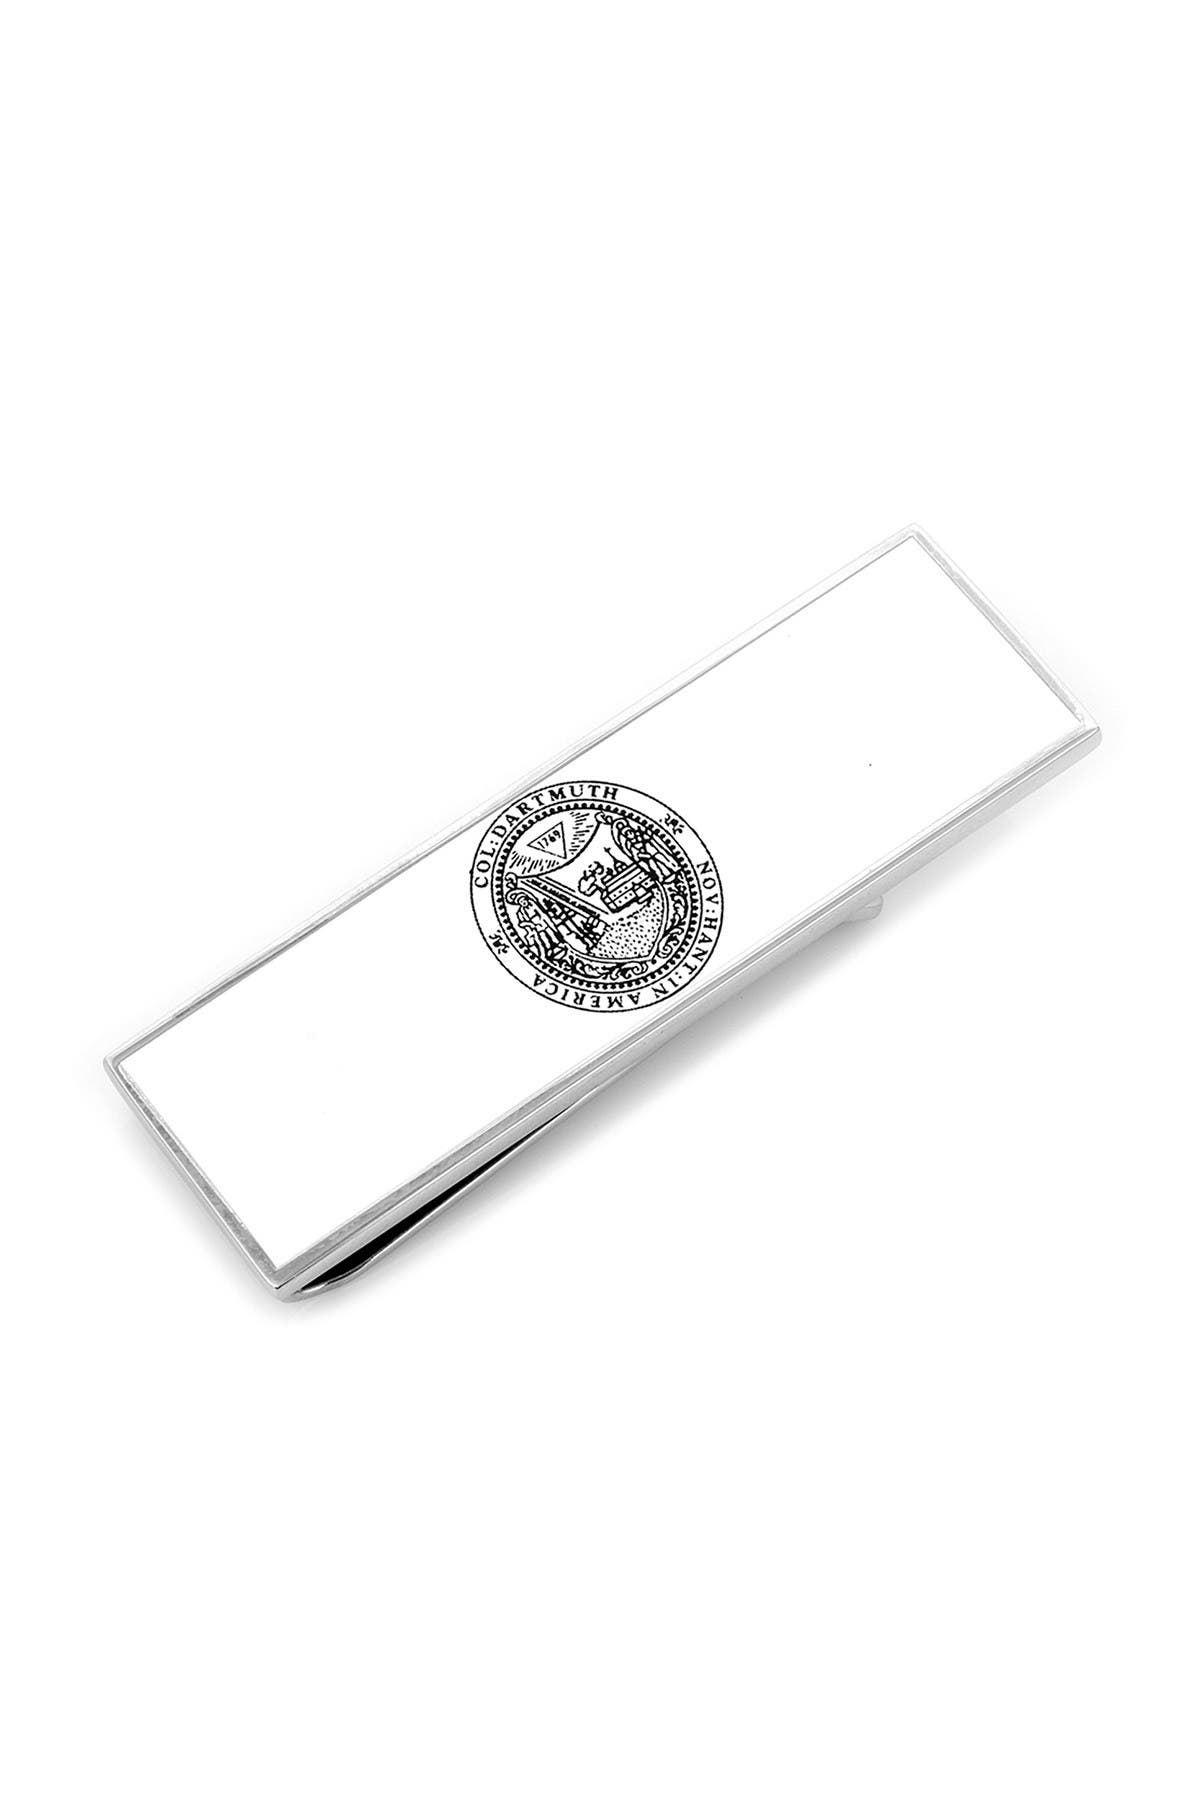 Image of Cufflinks Inc. Dartmouth College Money Clip